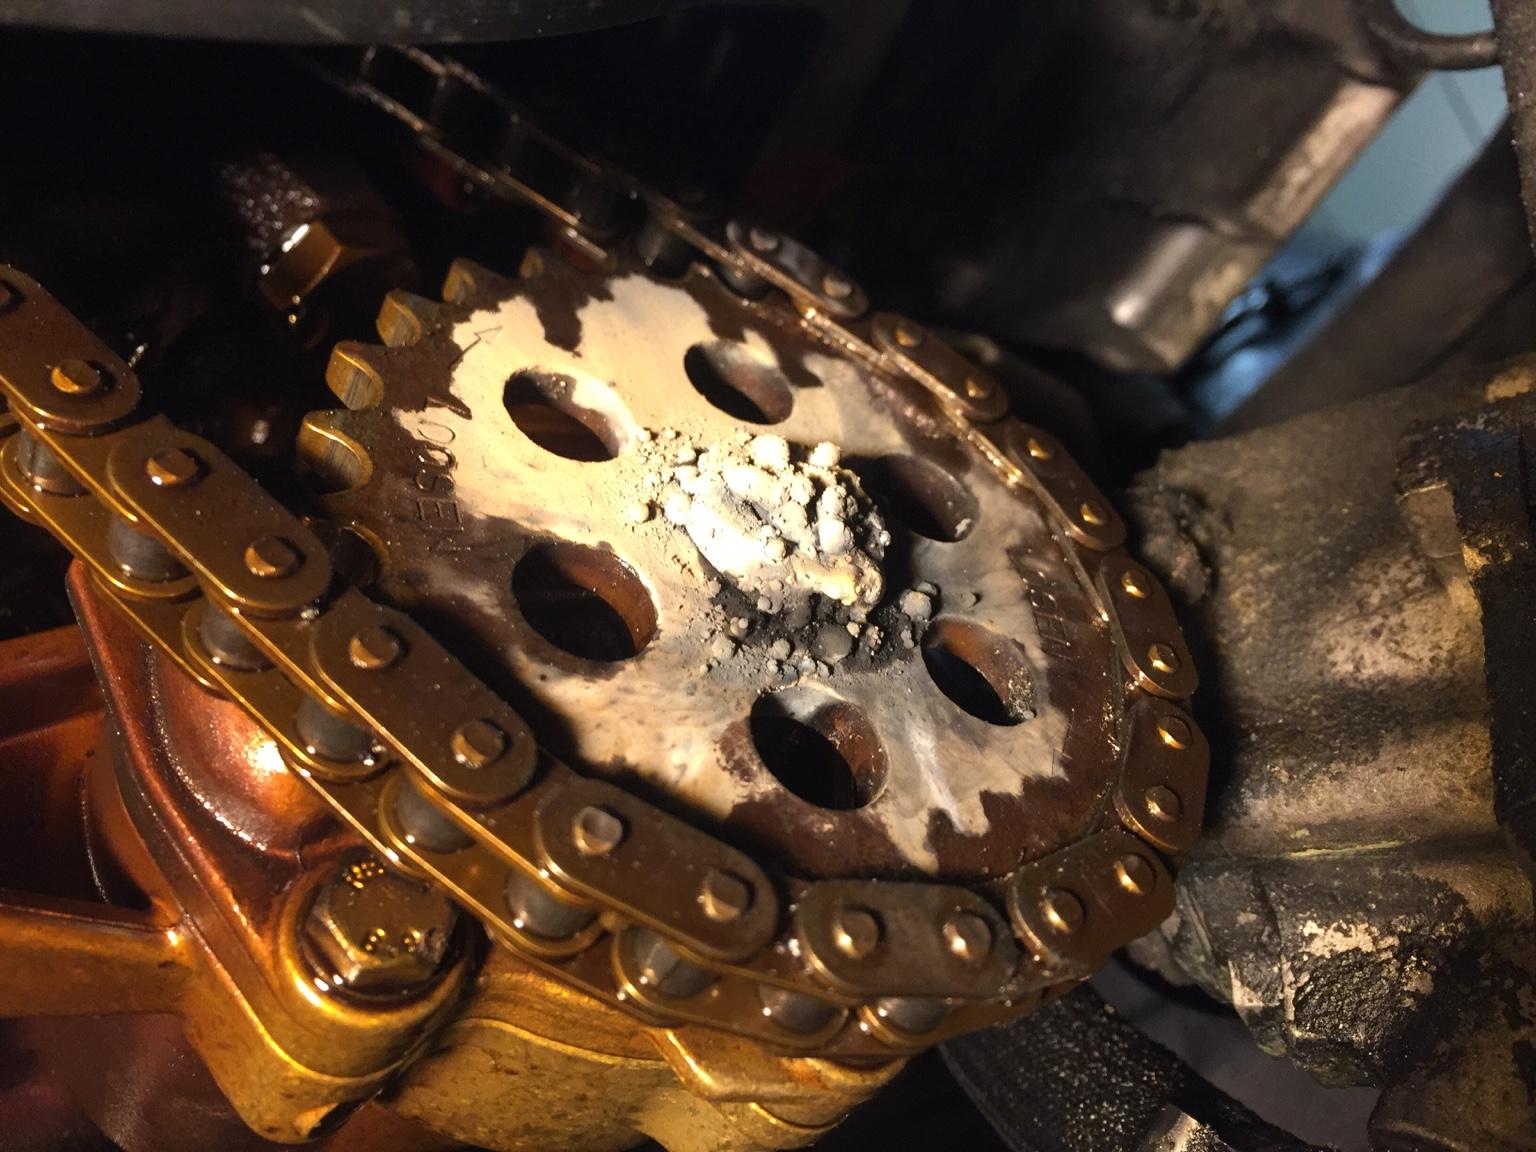 e46 330i oil pump nut